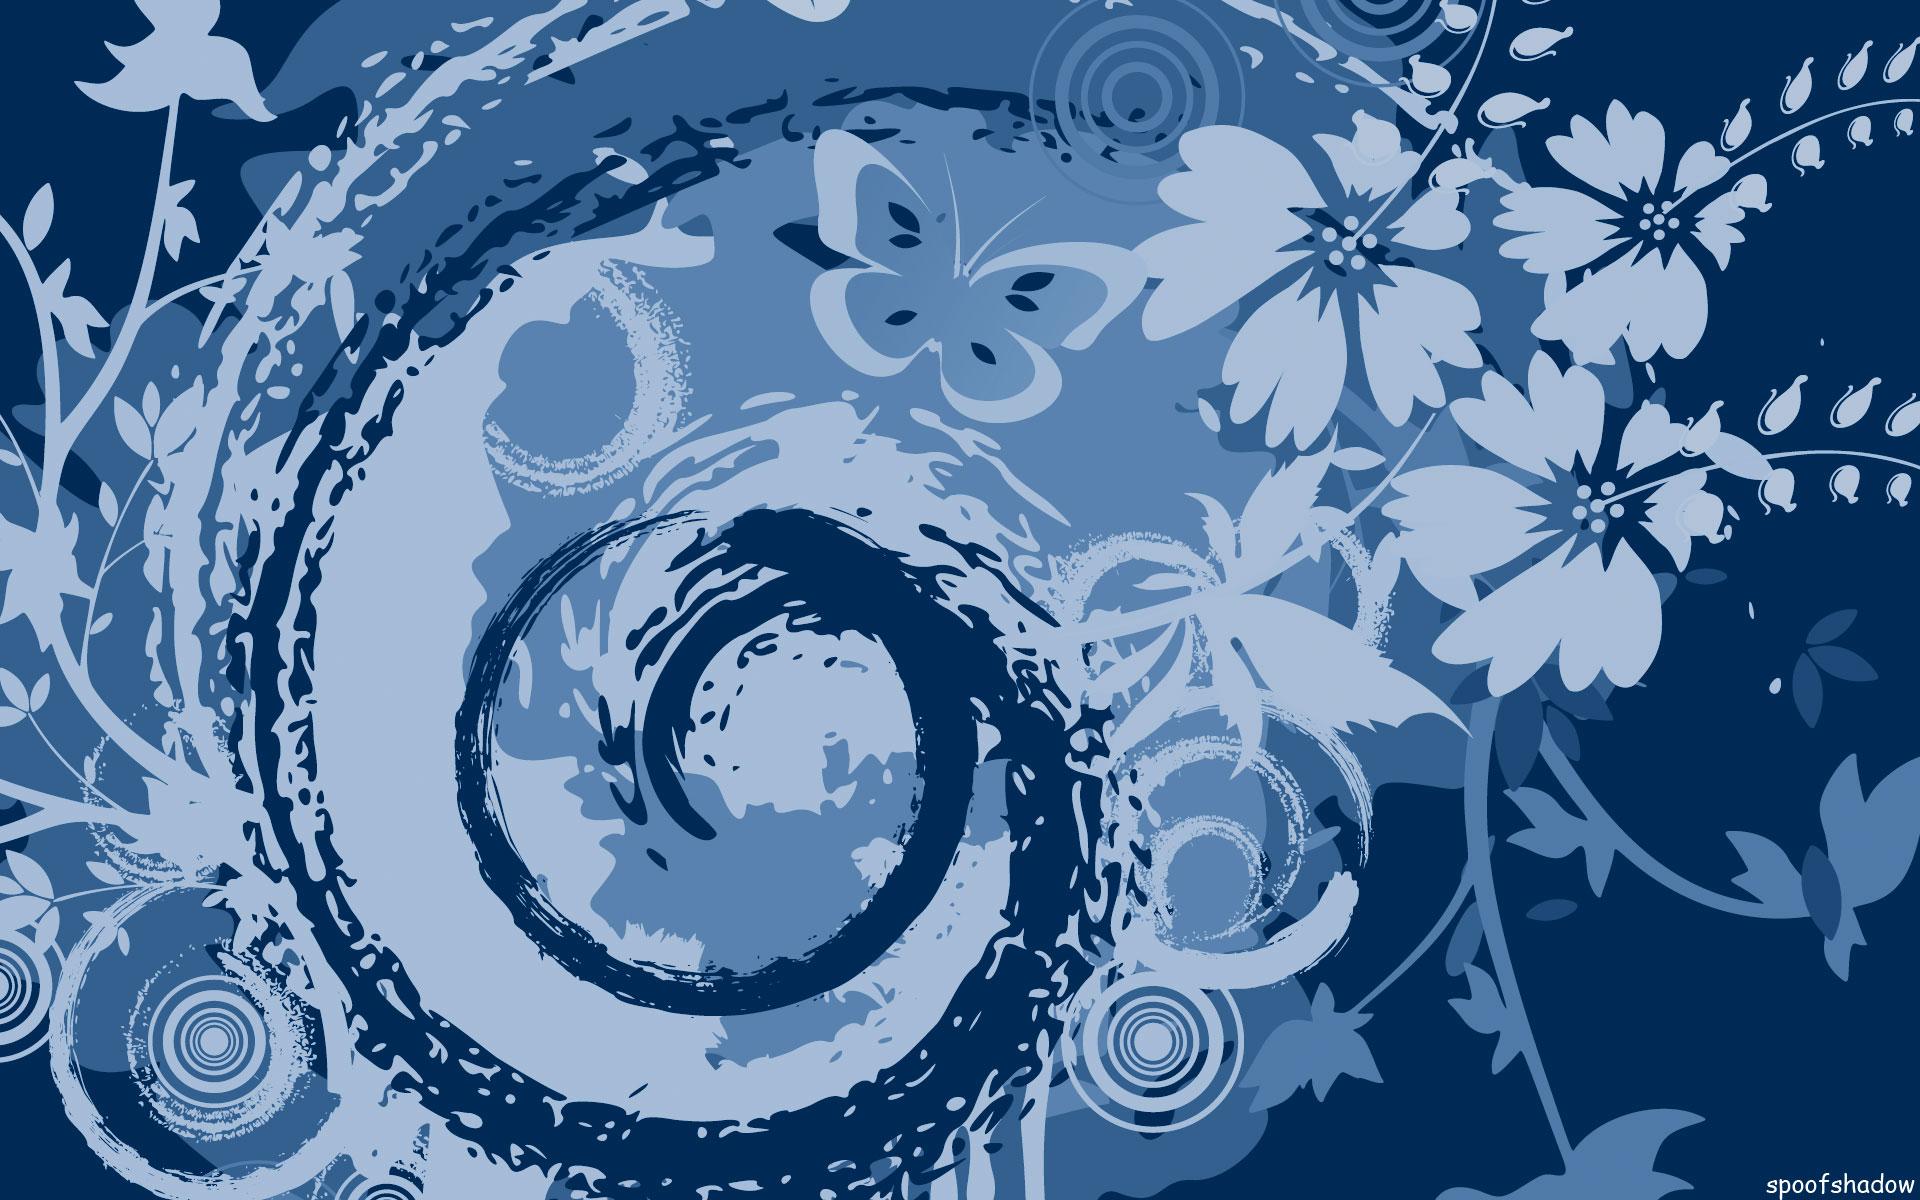 grunge, swirls, and flowers